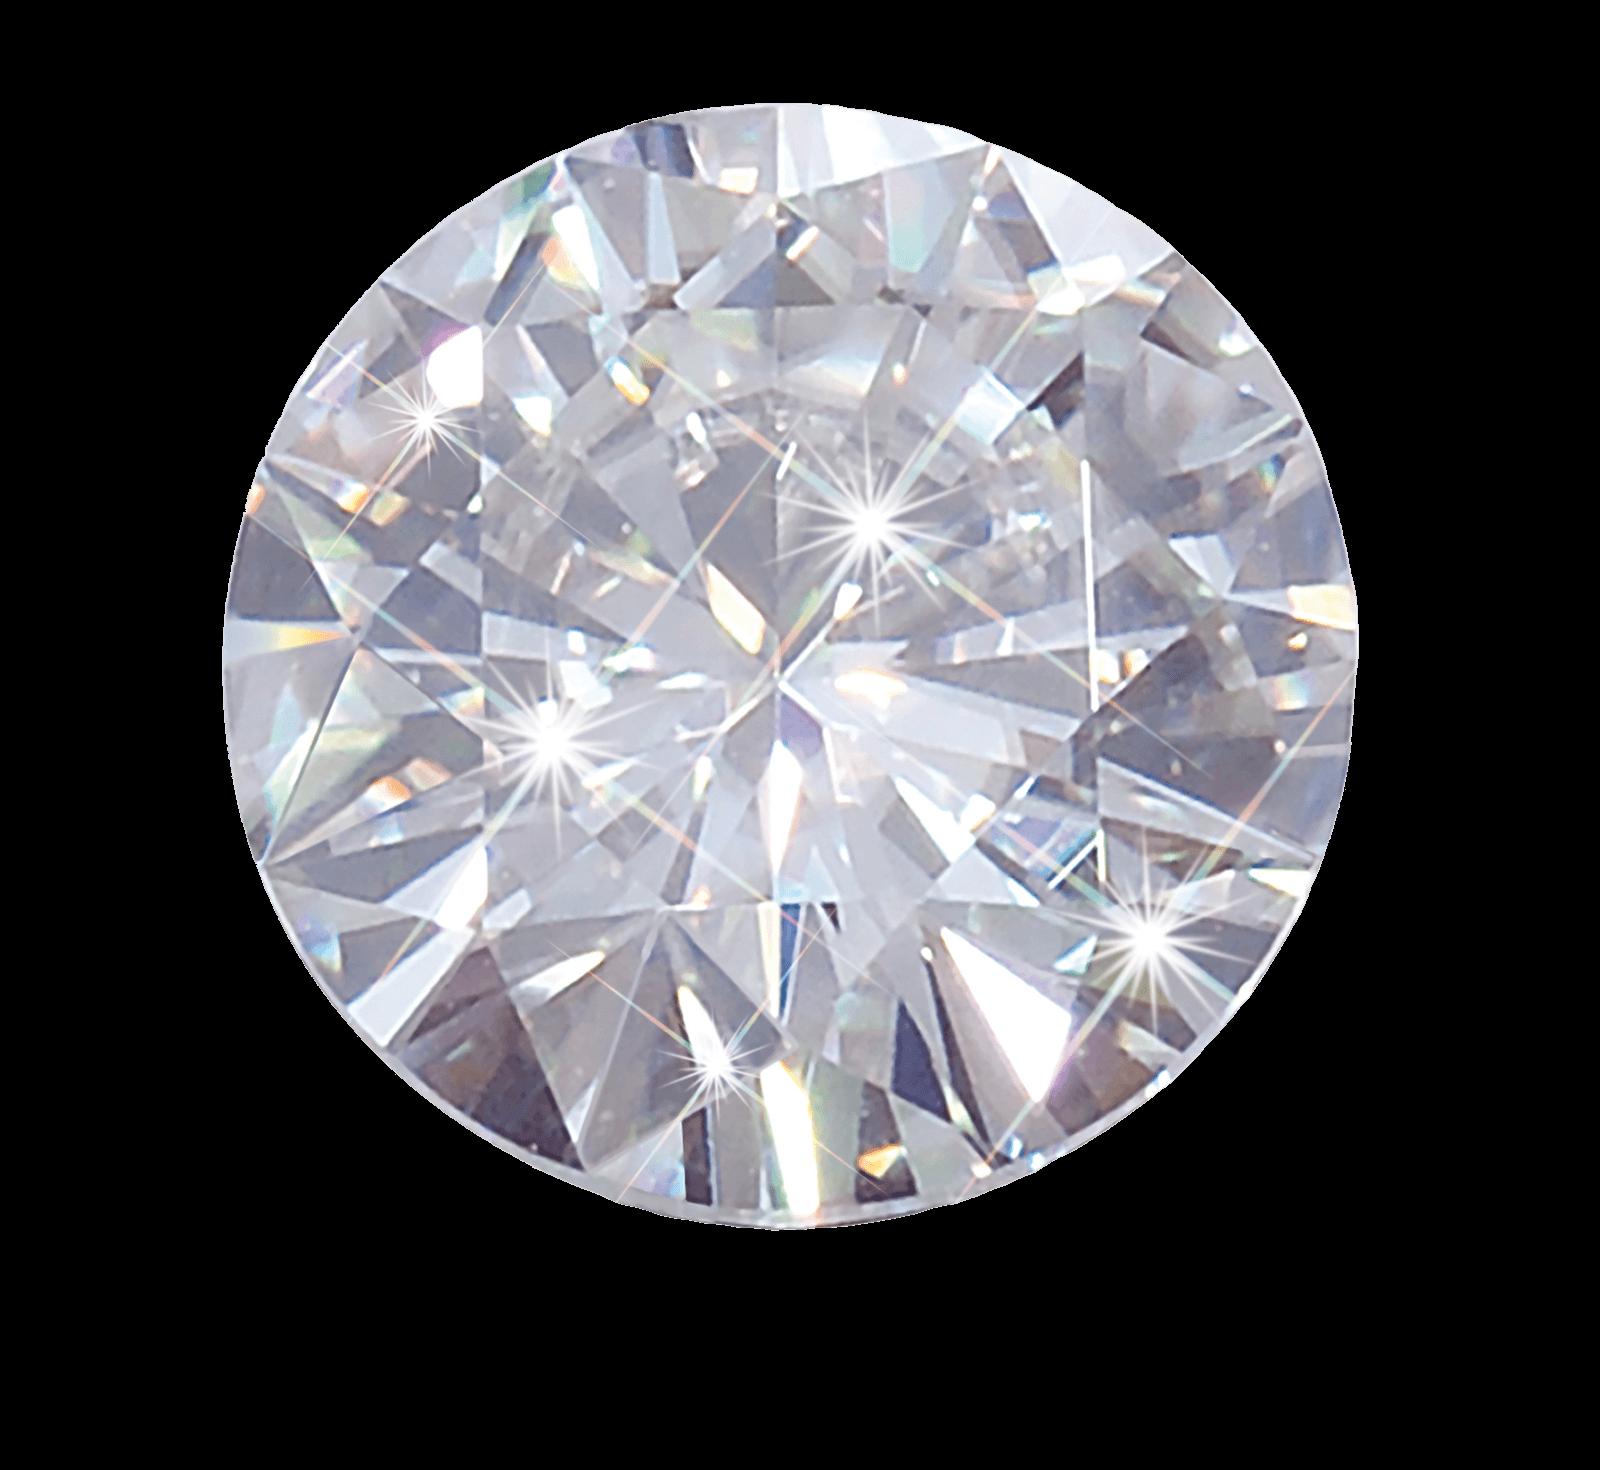 Round white diamond transparent. Jewel clipart daimond